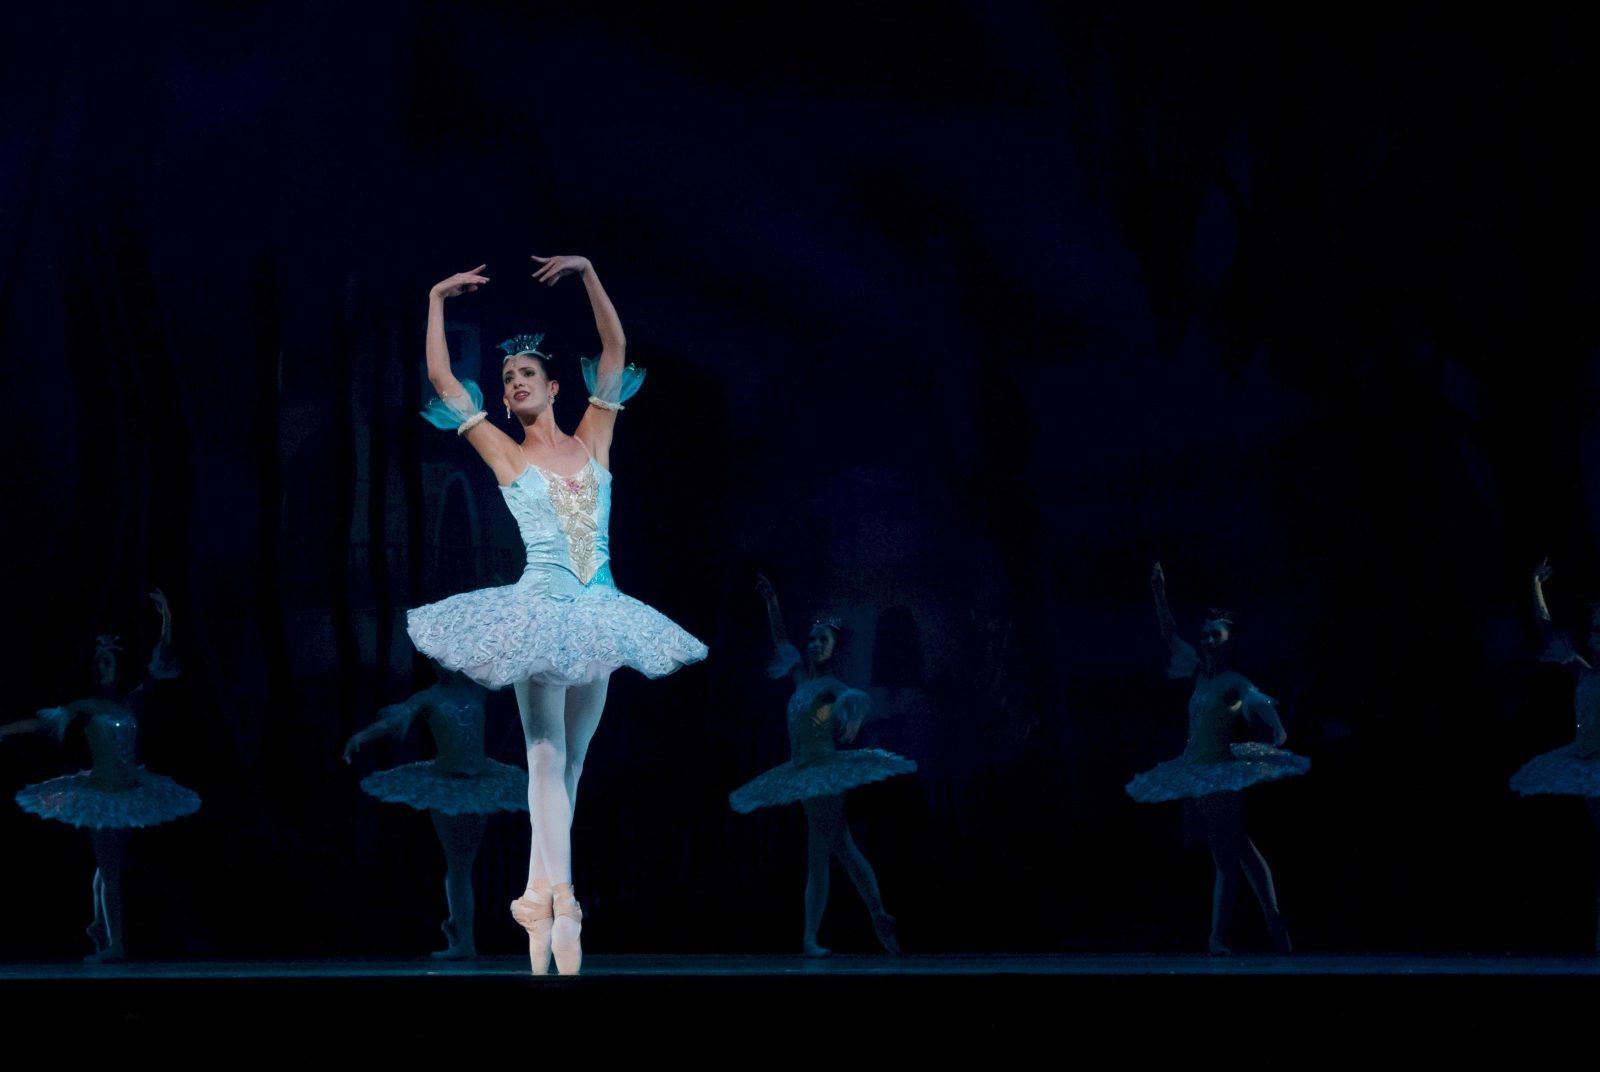 balance-ballerina-ballet